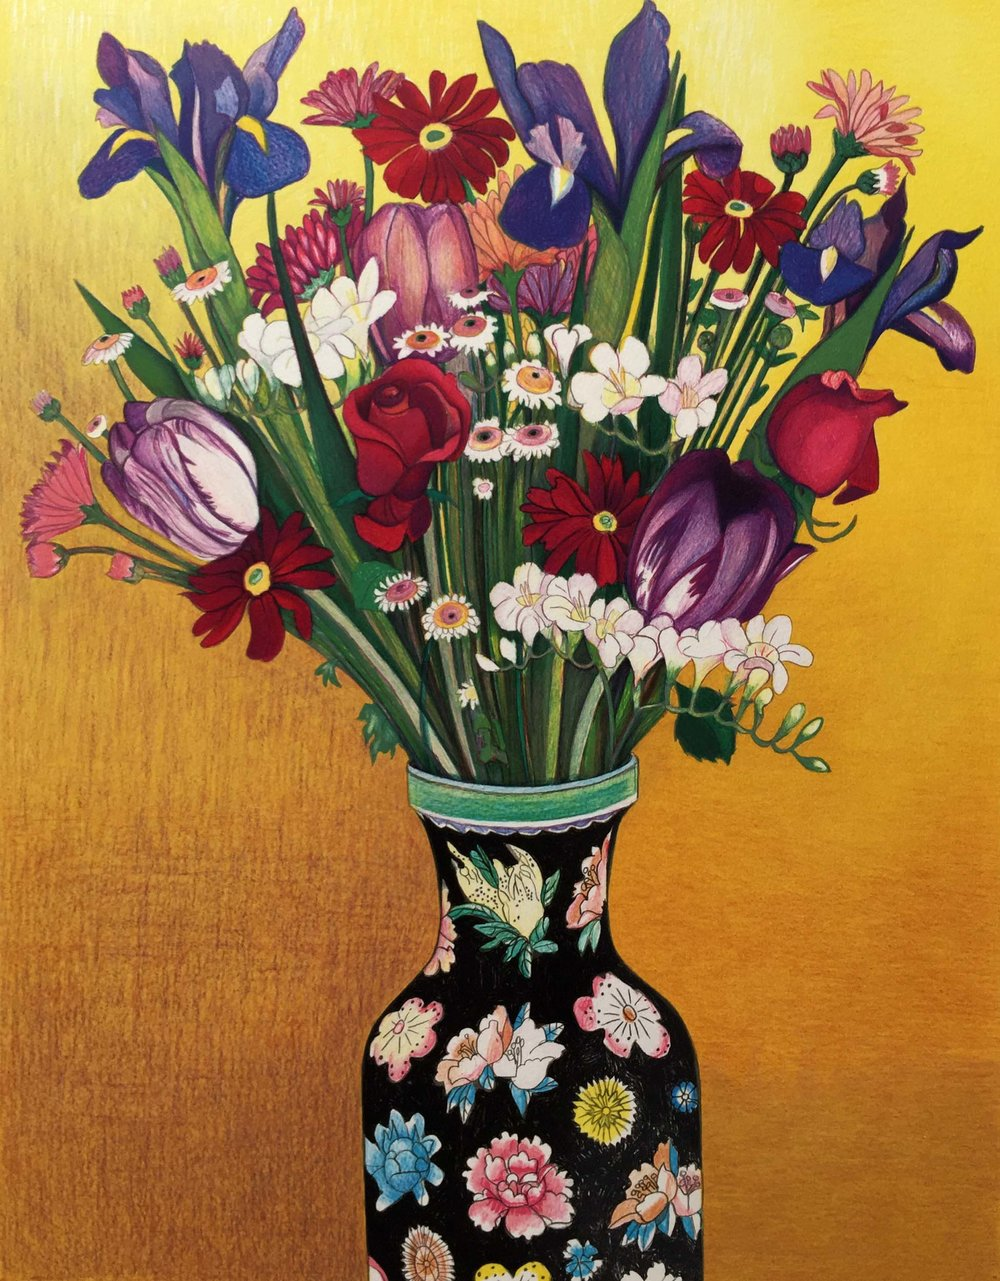 Flowers, Flowered Vase